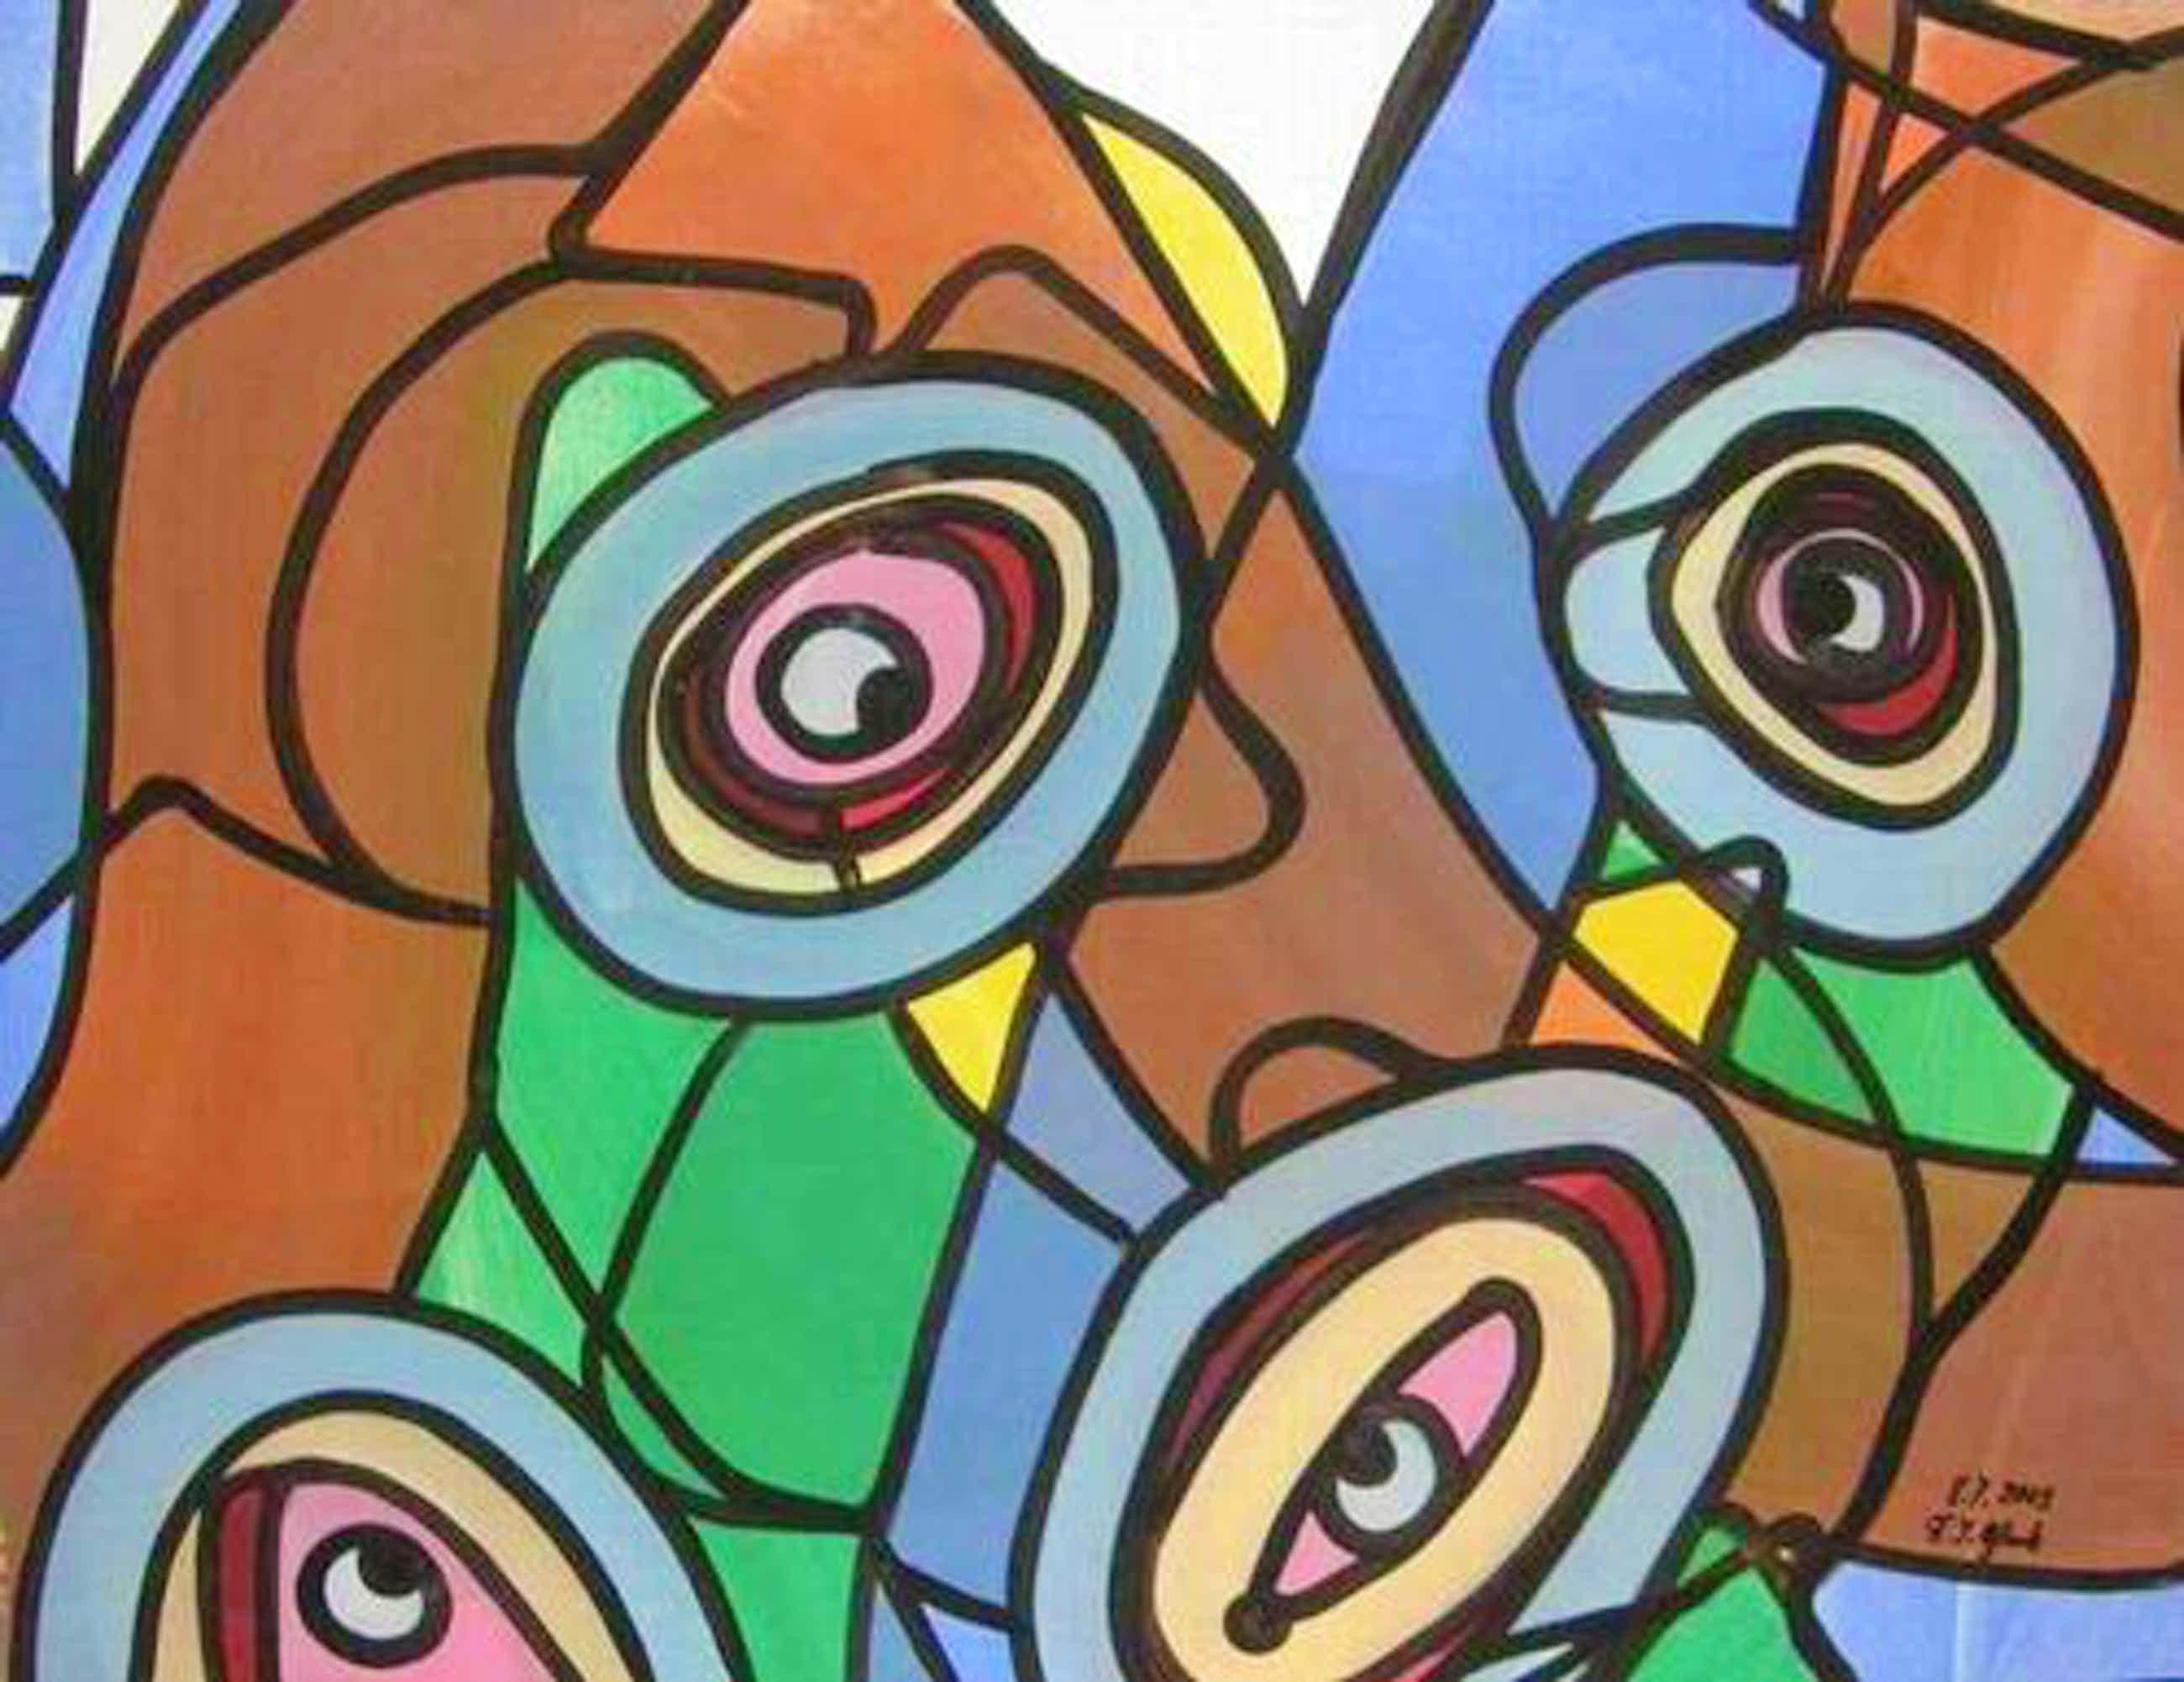 Franz J. Blank - AUGENWEIDE, Grosse POP-ART Acrylmalerei - Handsigniert 2003 (Extravaganza Florida VISIONEN 2000/01 kopen? Bied vanaf 99!